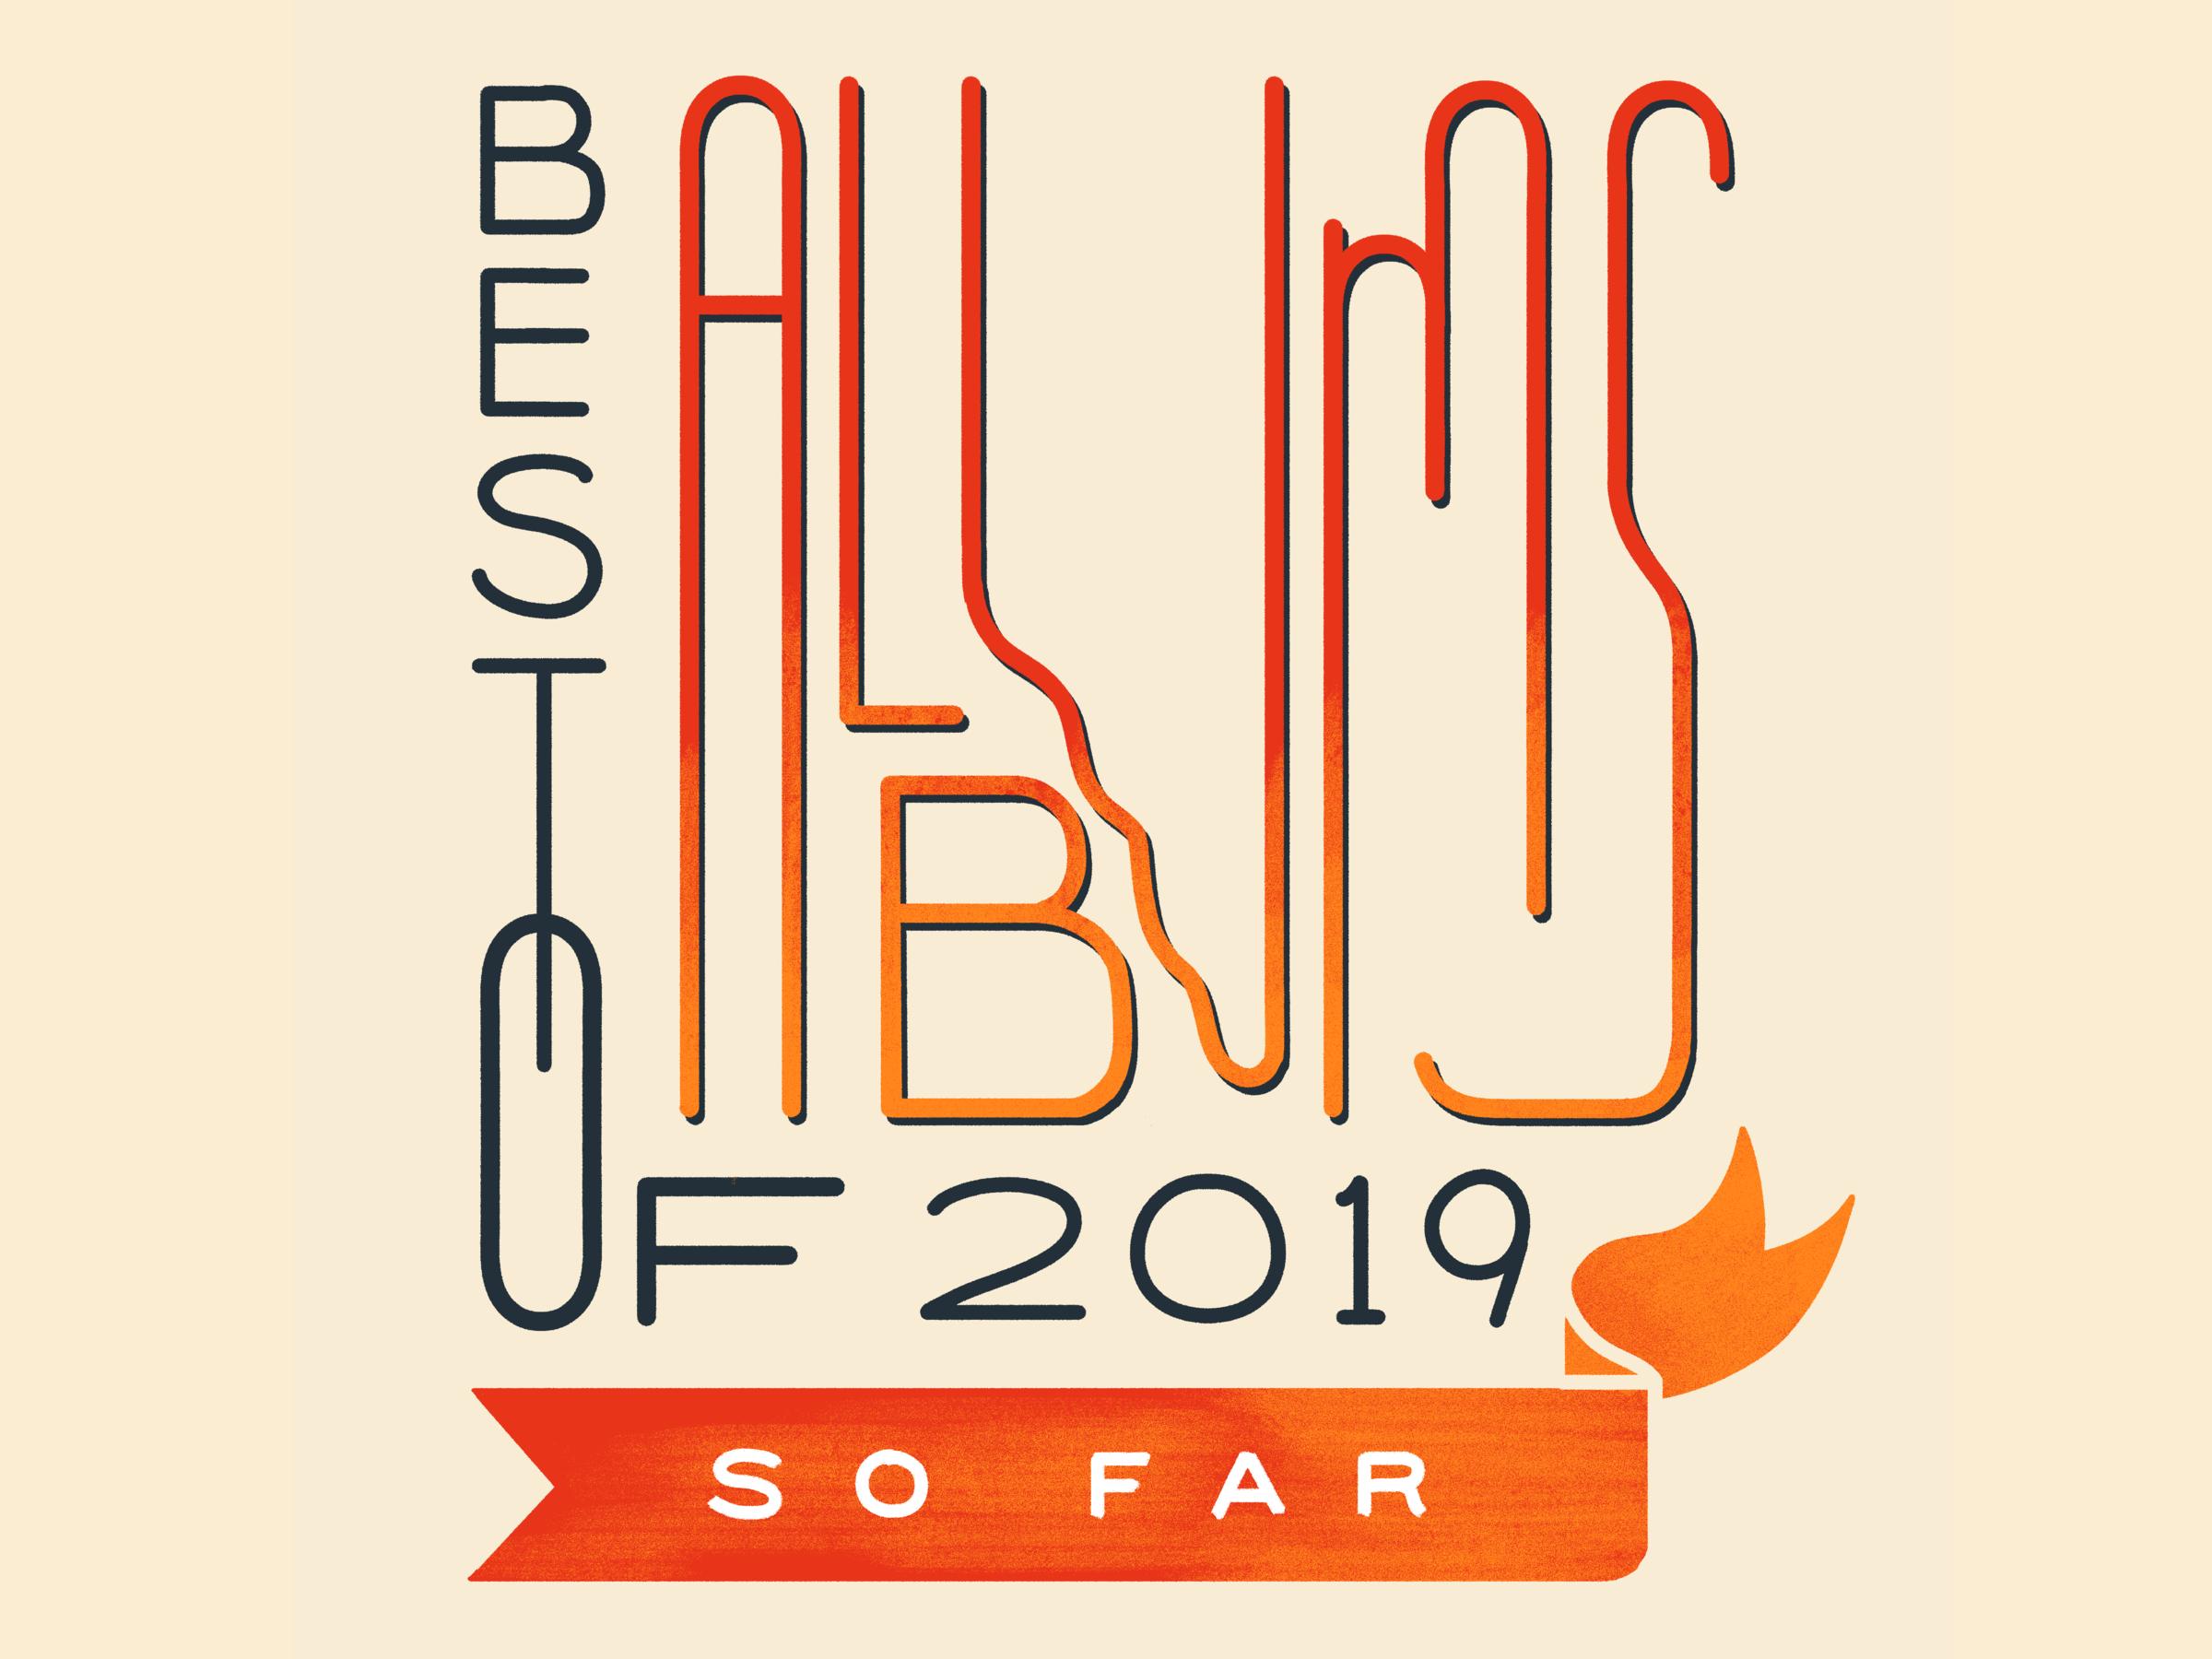 Npr Best Albums 2019 Best Albums Of 2019 (So Far)   NPR Illinois